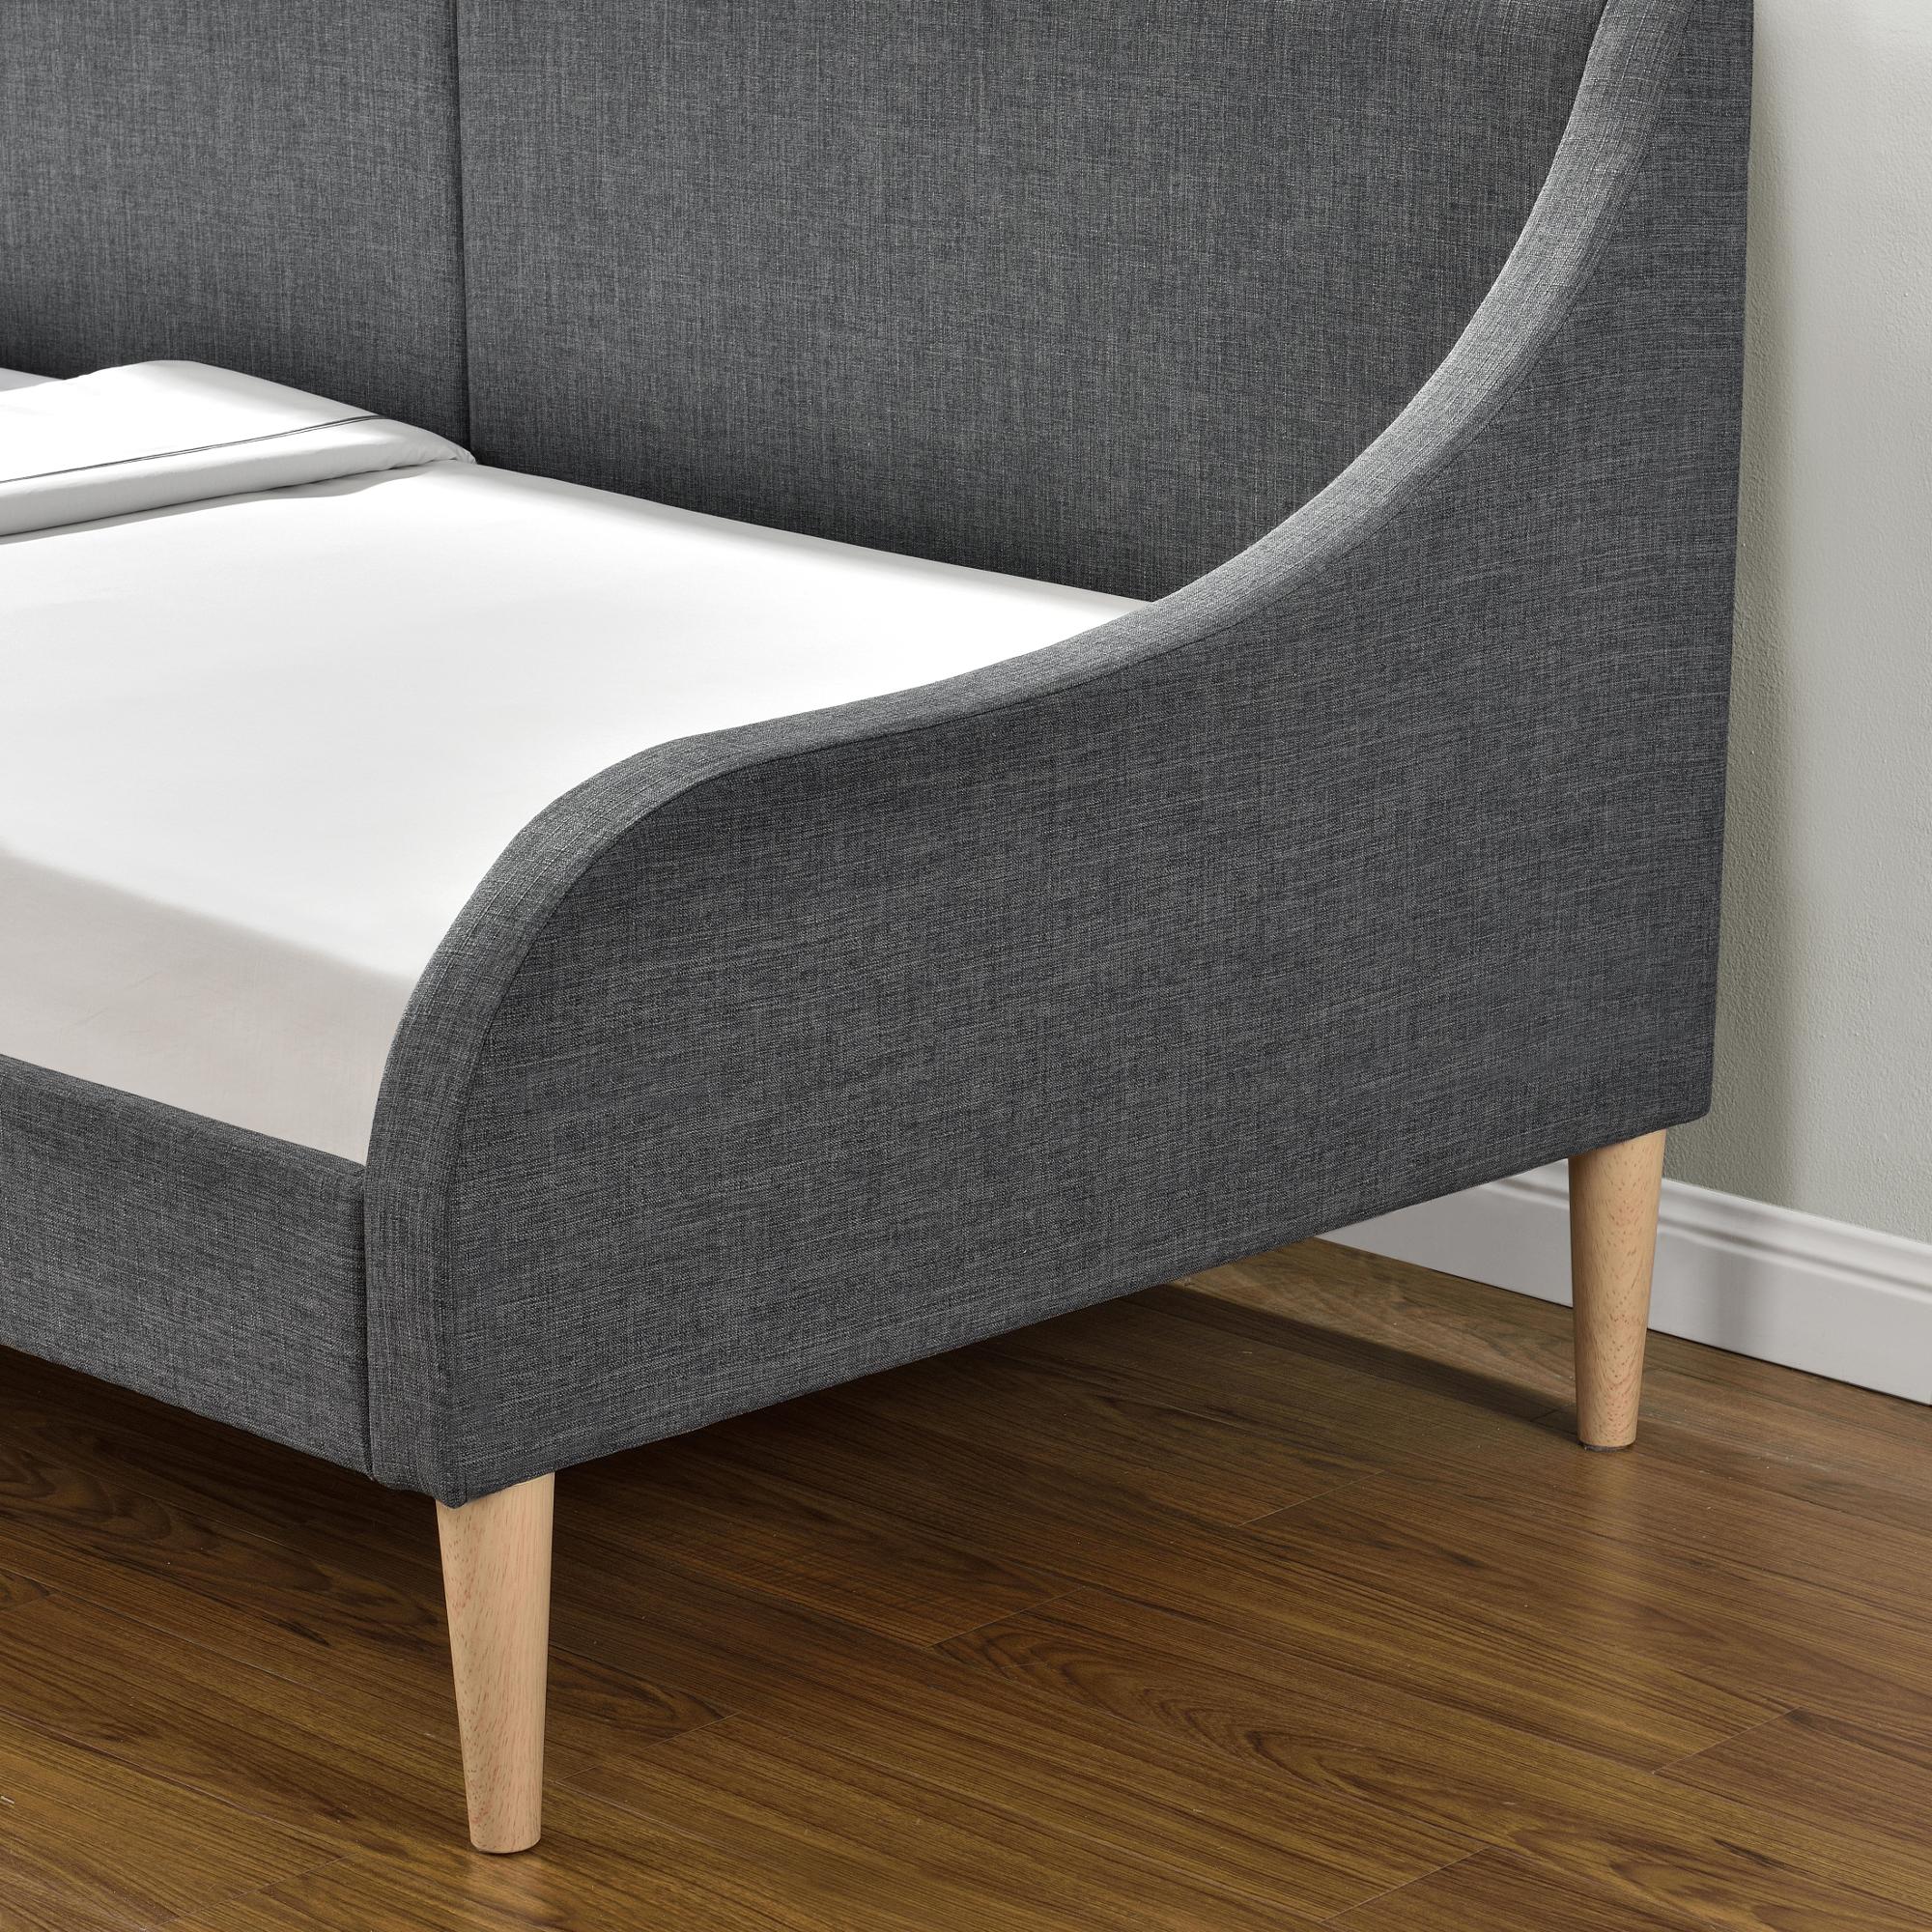 ® Tagesbett mit Matratze 90 x 200 cm Schlafsofa Bett Textil Bettgestell en.casa